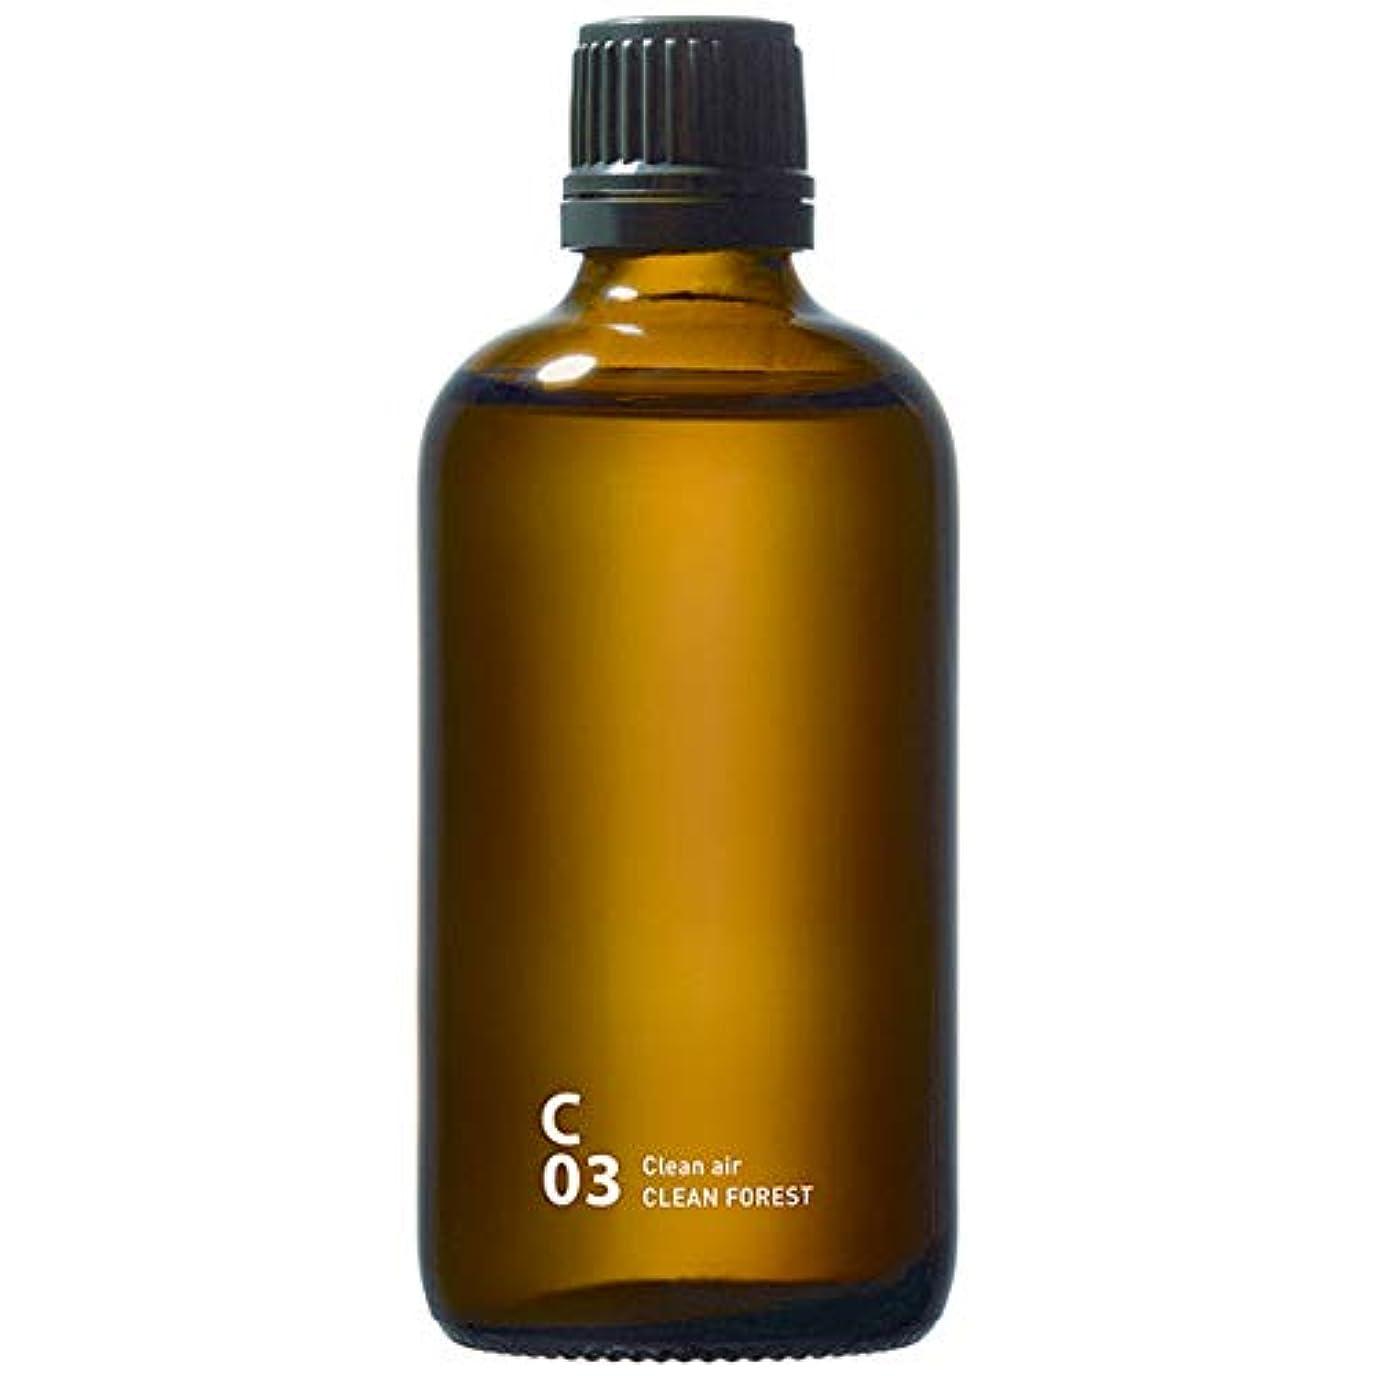 百年感謝祭重量C03 CLEAN FOREST piezo aroma oil 100ml